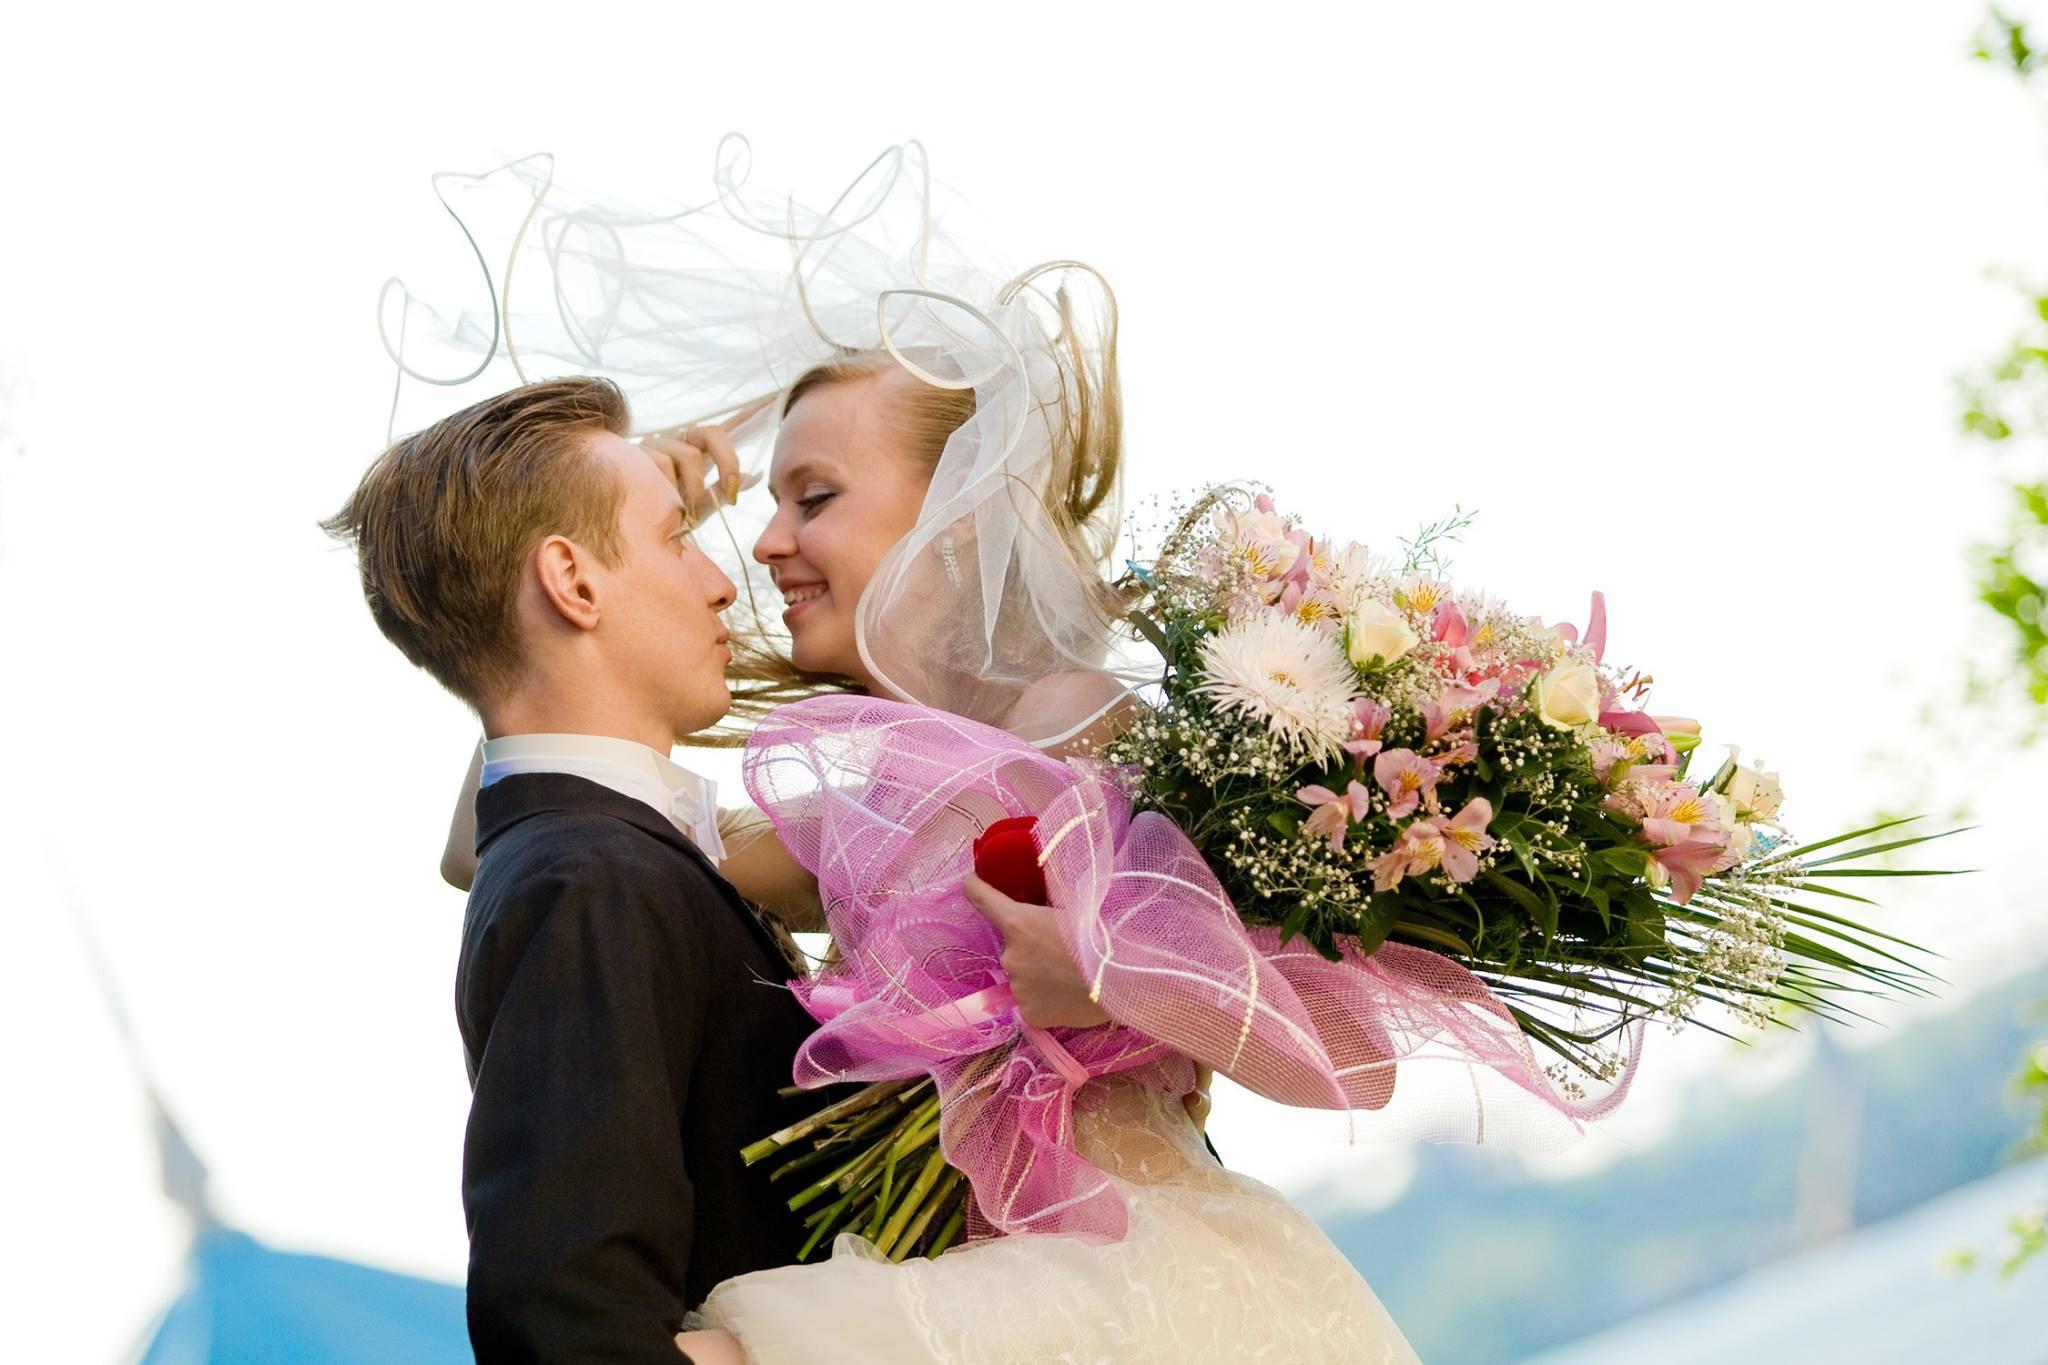 صور عريس وعروسه يوم الزفاف 15 صور عريس وعروسه يوم الزفاف